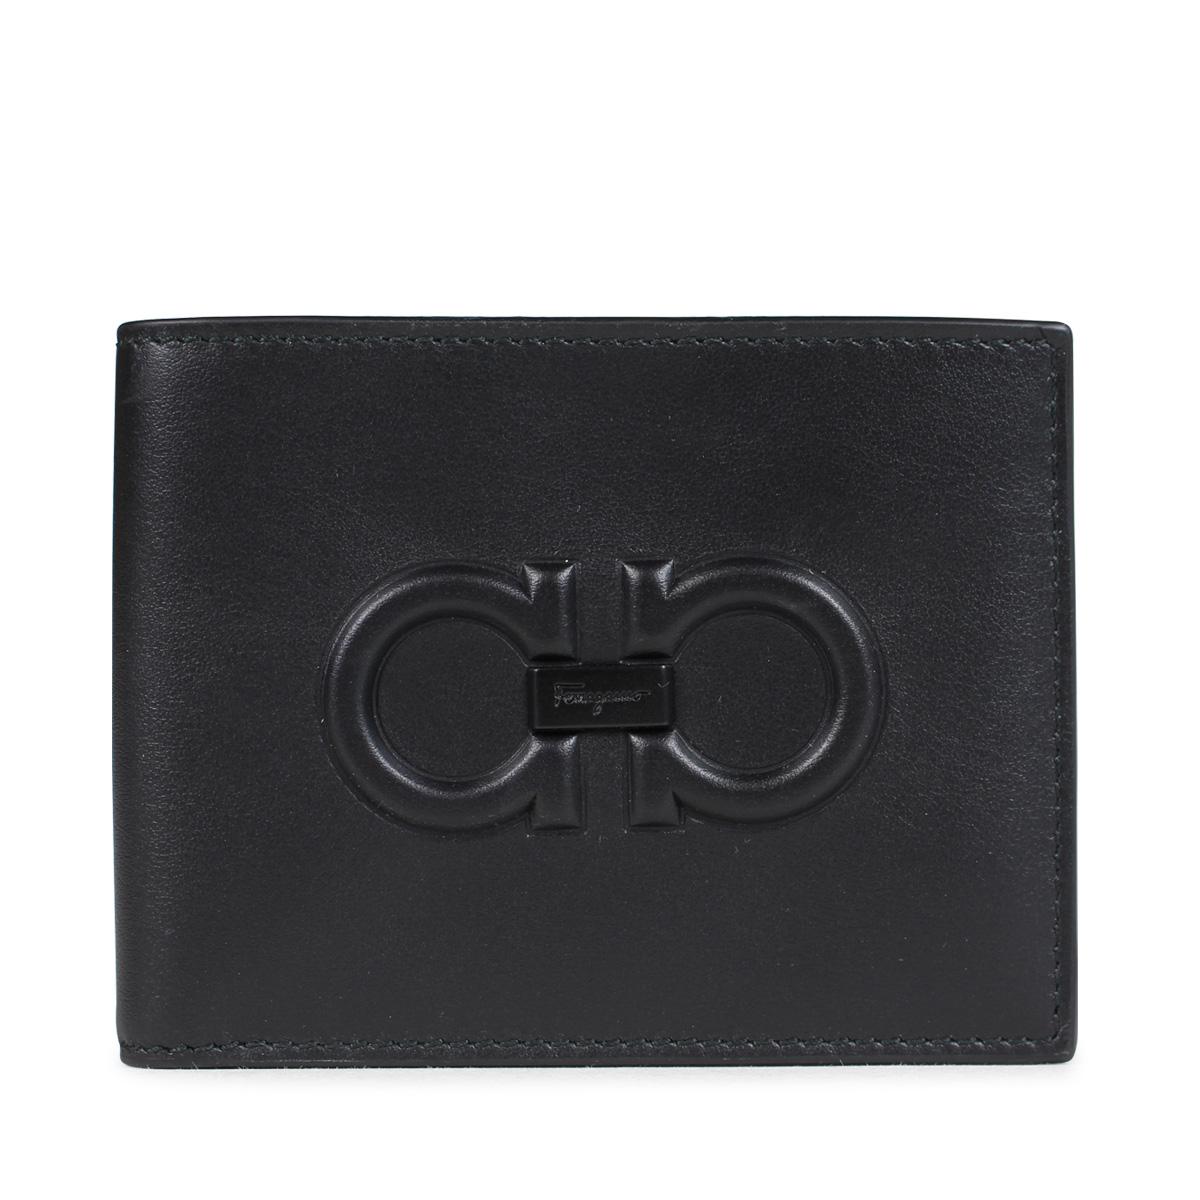 Salvatore Ferragamo FIRENZE LOGO WALLET Ferragamo wallet men folio black  66A248  10 23 Shinnyu load   1810  8f3ad52bac